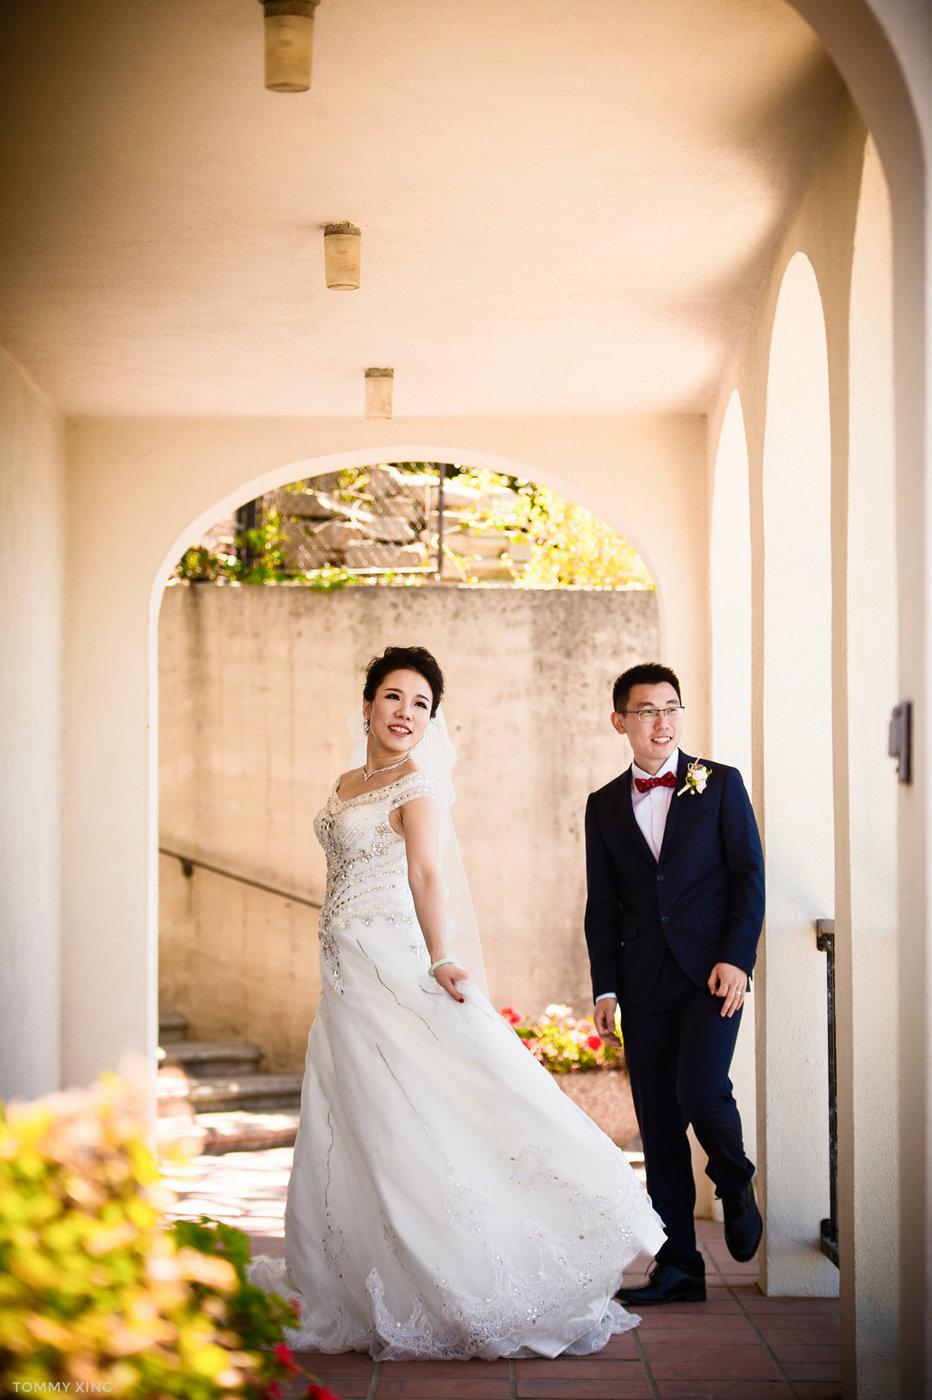 Neighborhood Church Wedding Ranho Palos Verdes Los Angeles Tommy Xing Photography 洛杉矶旧金山婚礼婚纱照摄影师 122.jpg